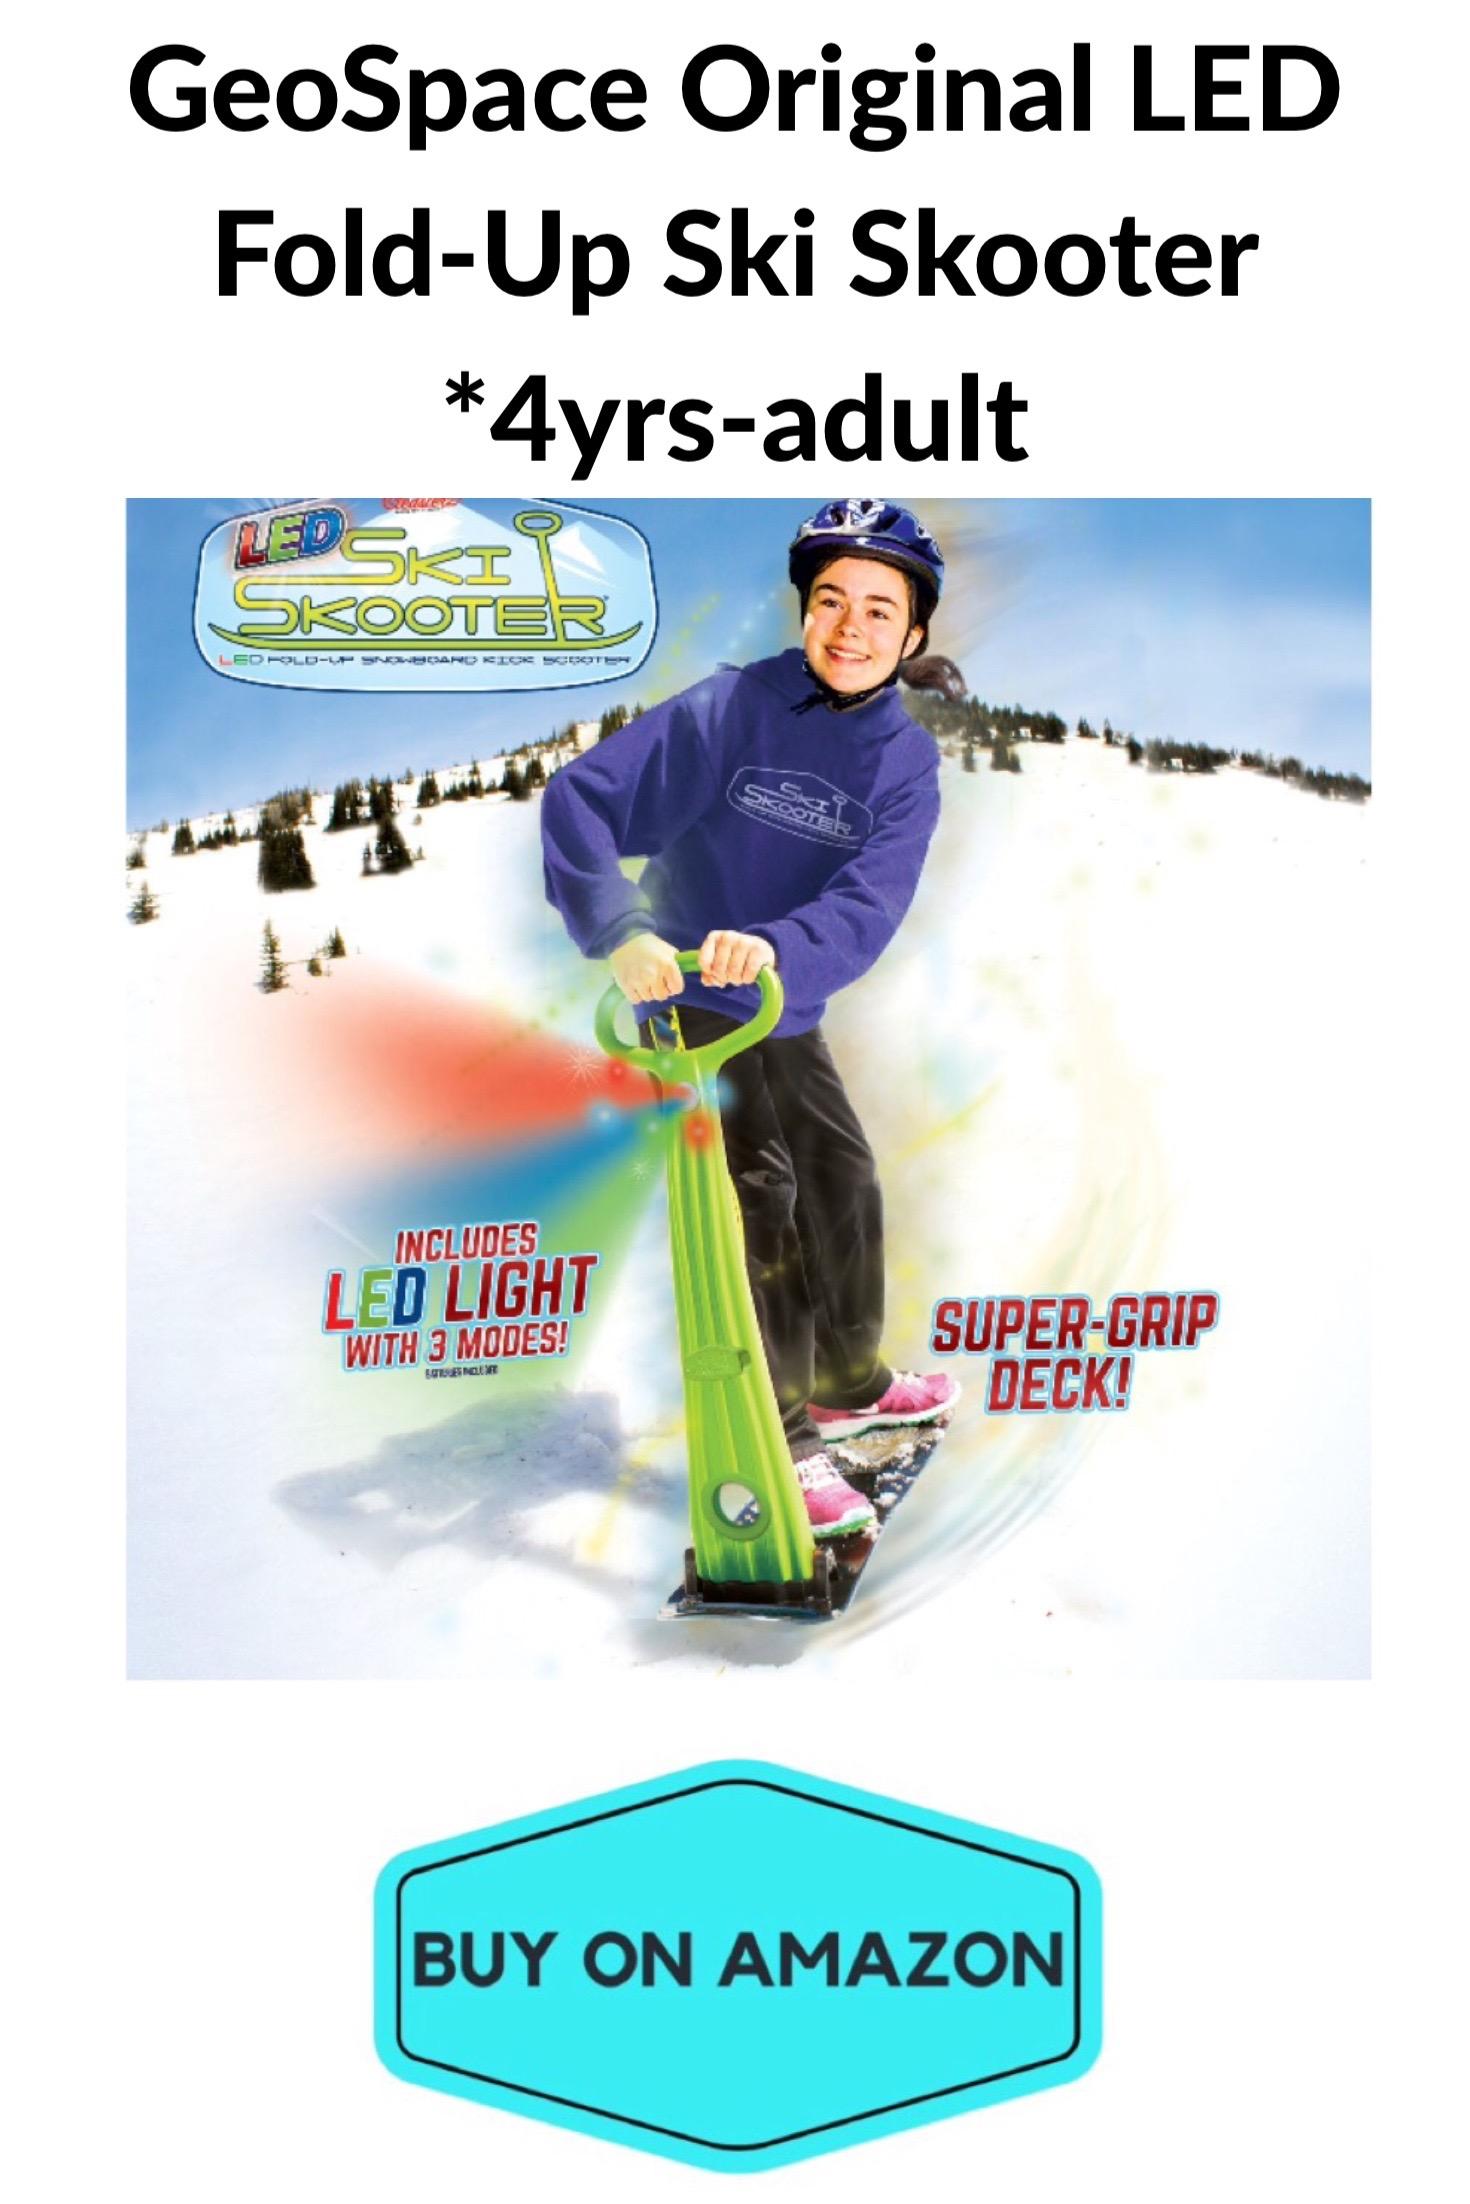 GeoSpace LED Fold Up Ski Skooter, Ages 4-Adult